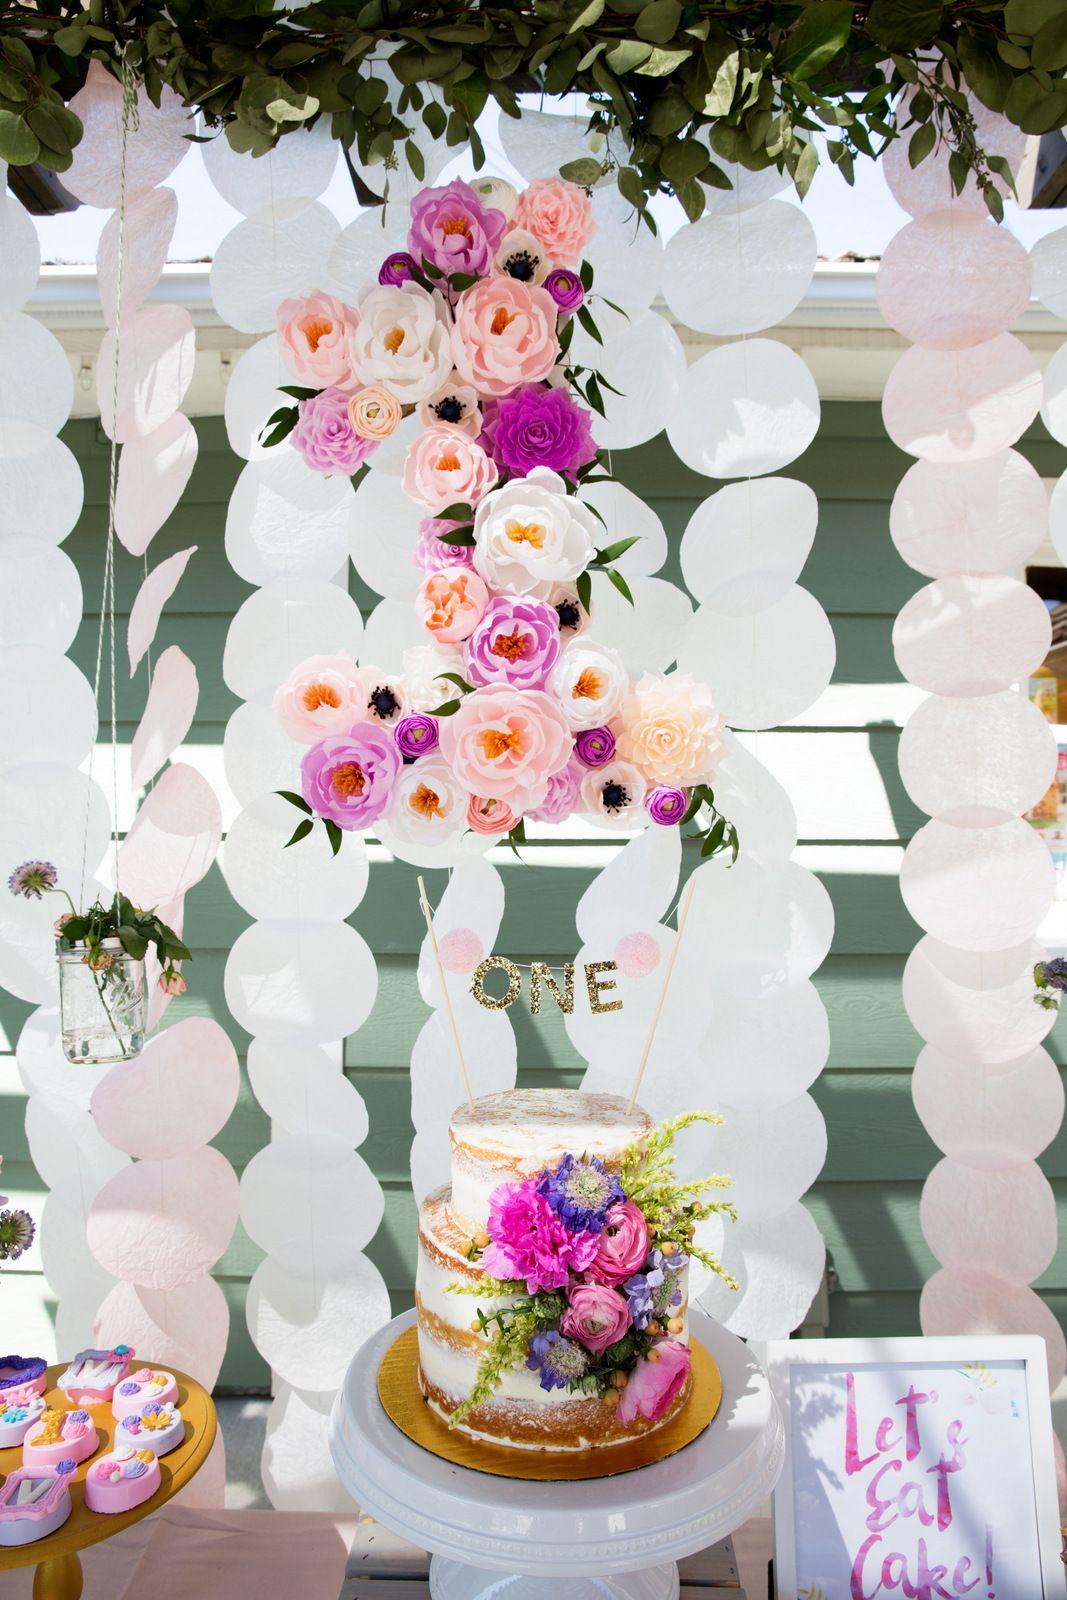 Vivians garden 1st birthday party sweet girls birthdays and a flower garden 1st birthday party for a sweet girl izmirmasajfo